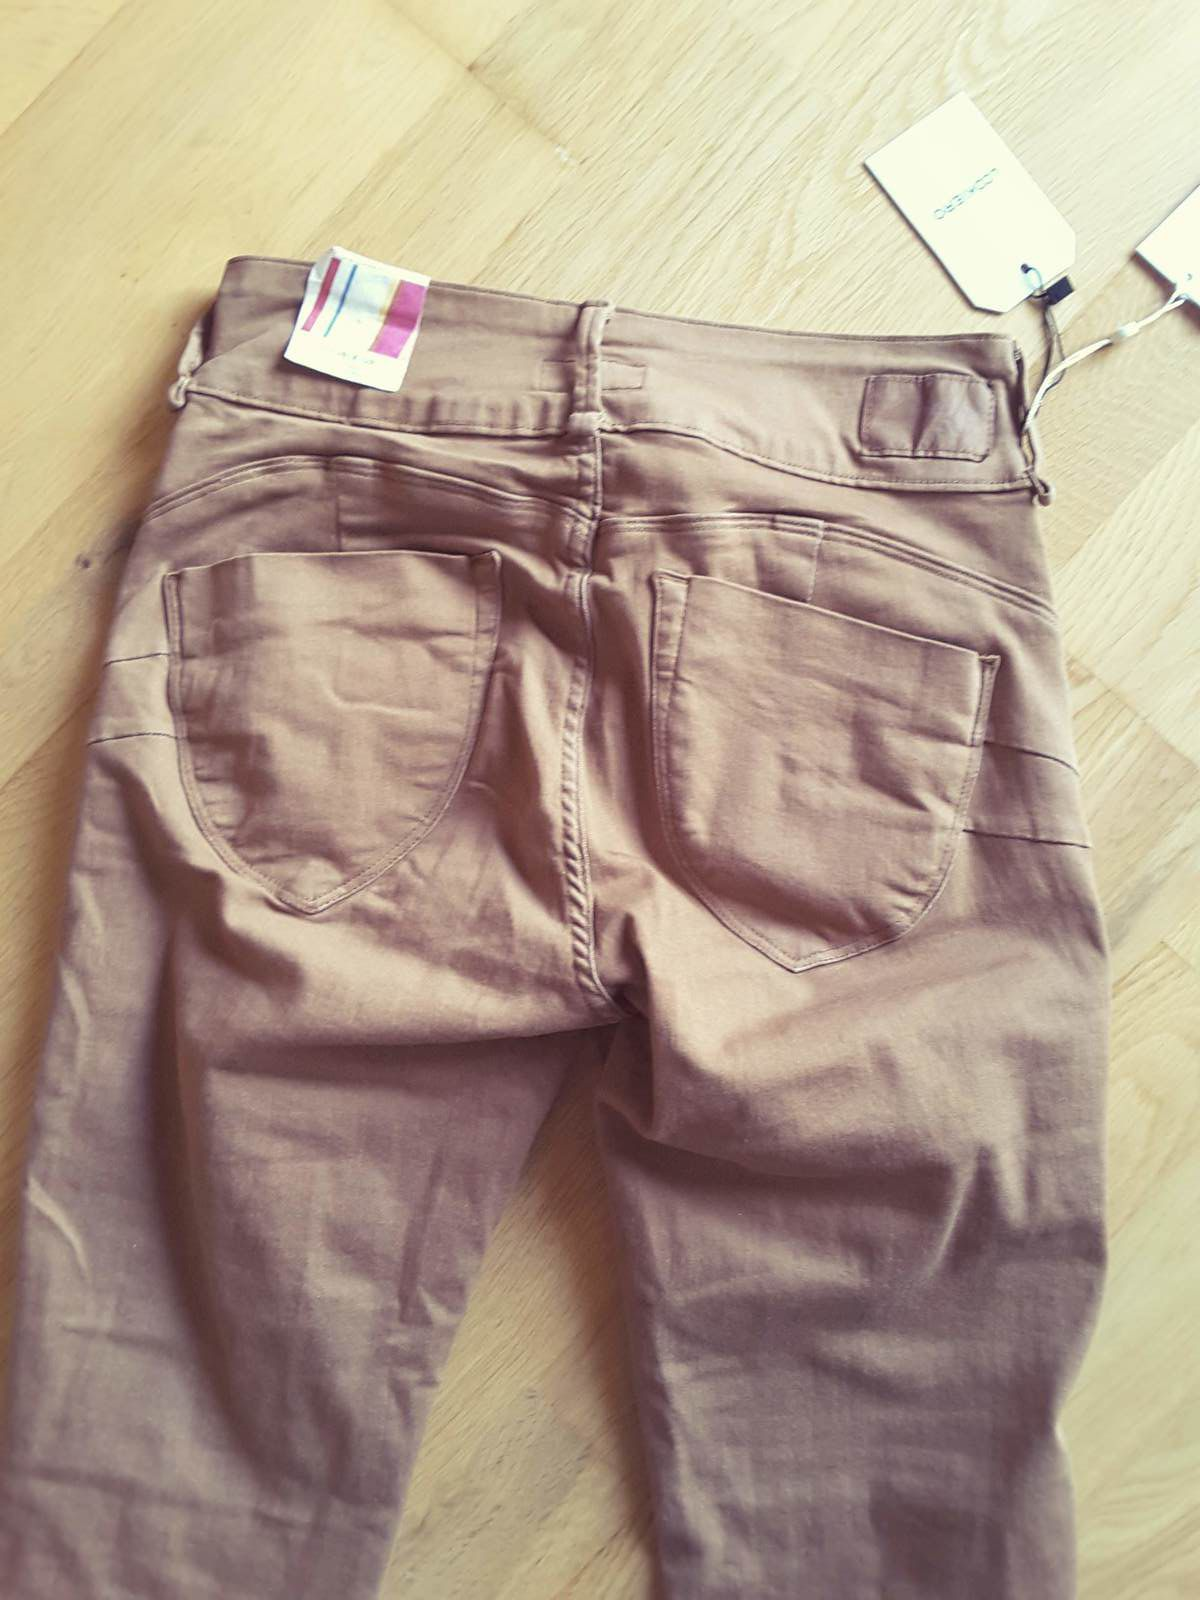 lookiero  jean Dou Jeans onesize Brown light - Tiffosi missbonsplansdunet personal shopper styliste box vêtements bon plan mode shopping